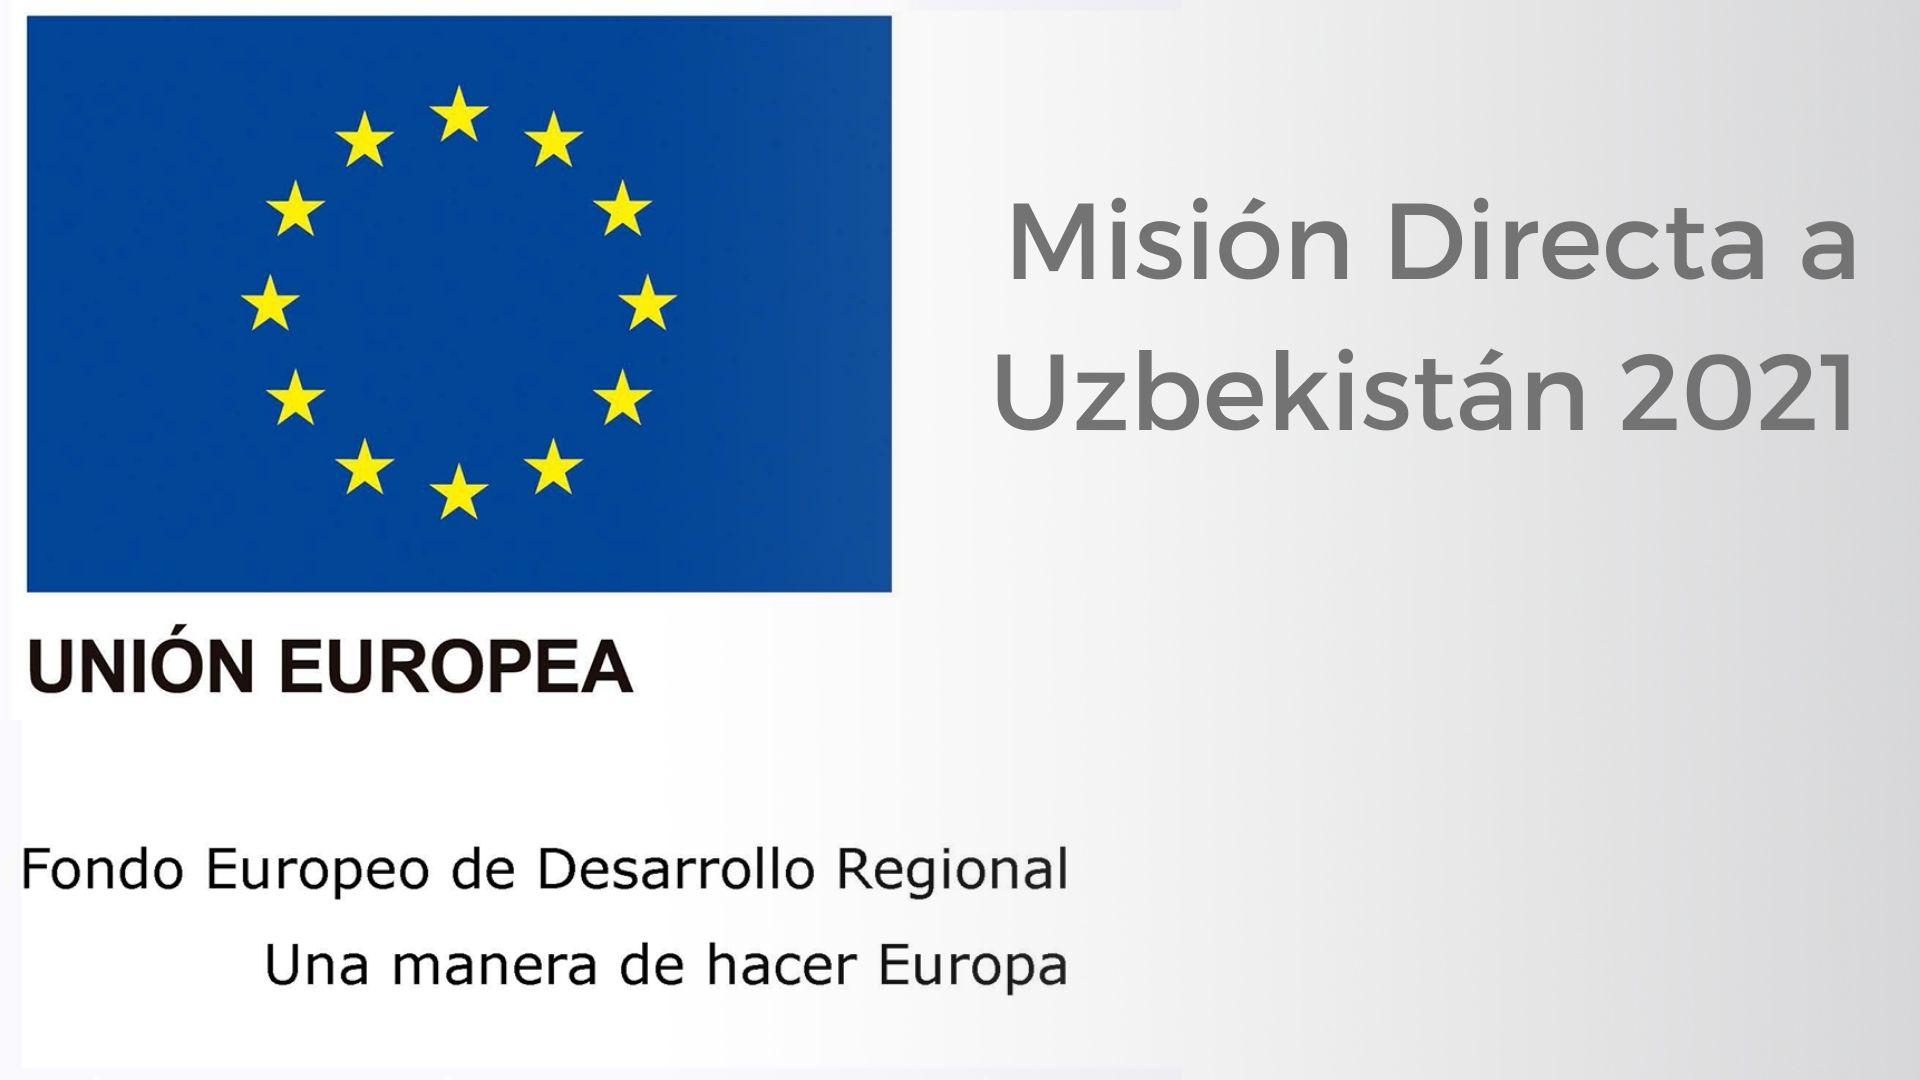 Miningland Misión Directa a Uzbekistán 2021